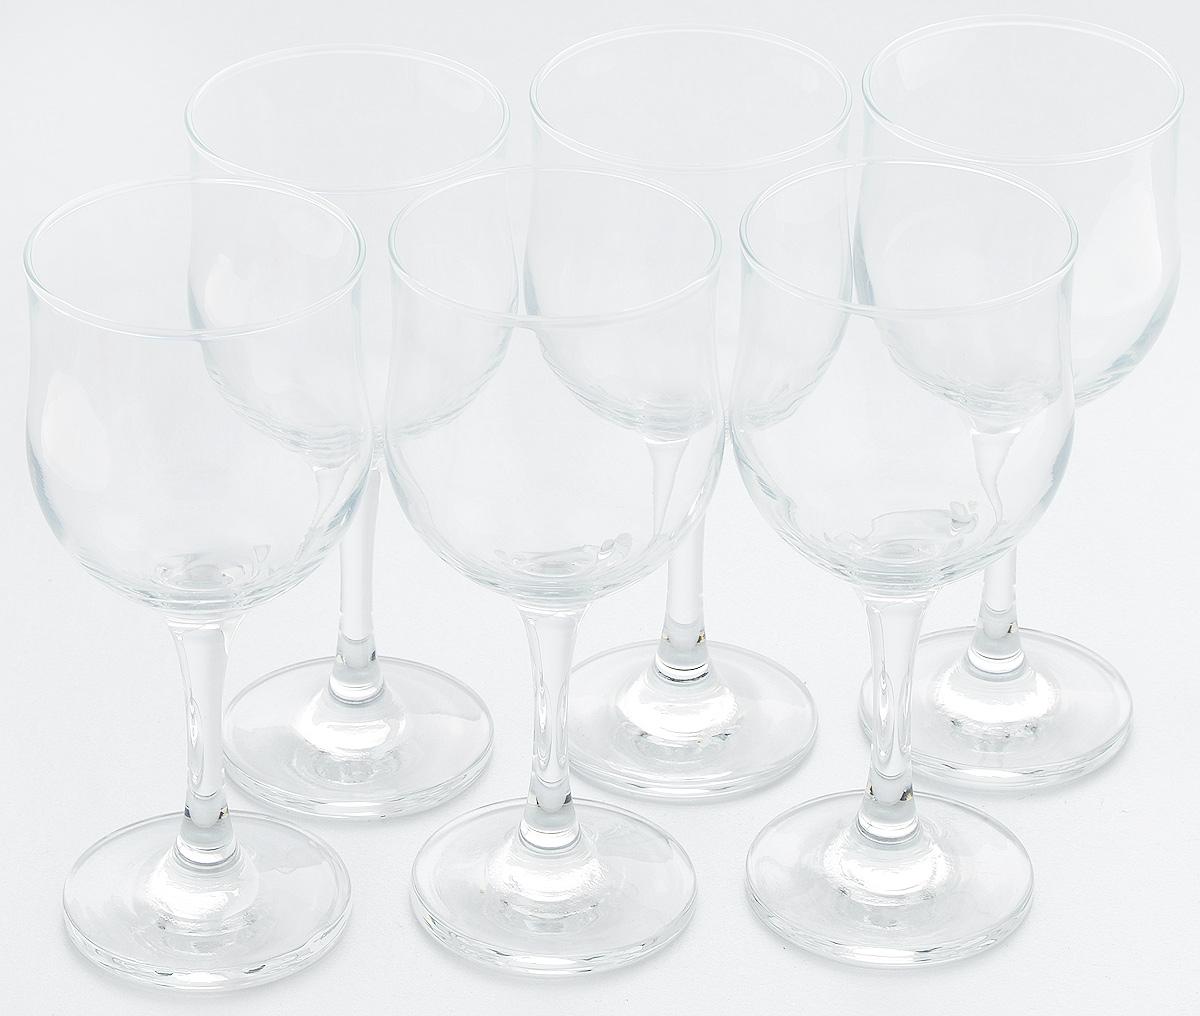 Набор бокалов для красного вина Pasabahce Tulipe, 240 мл, 6 шт